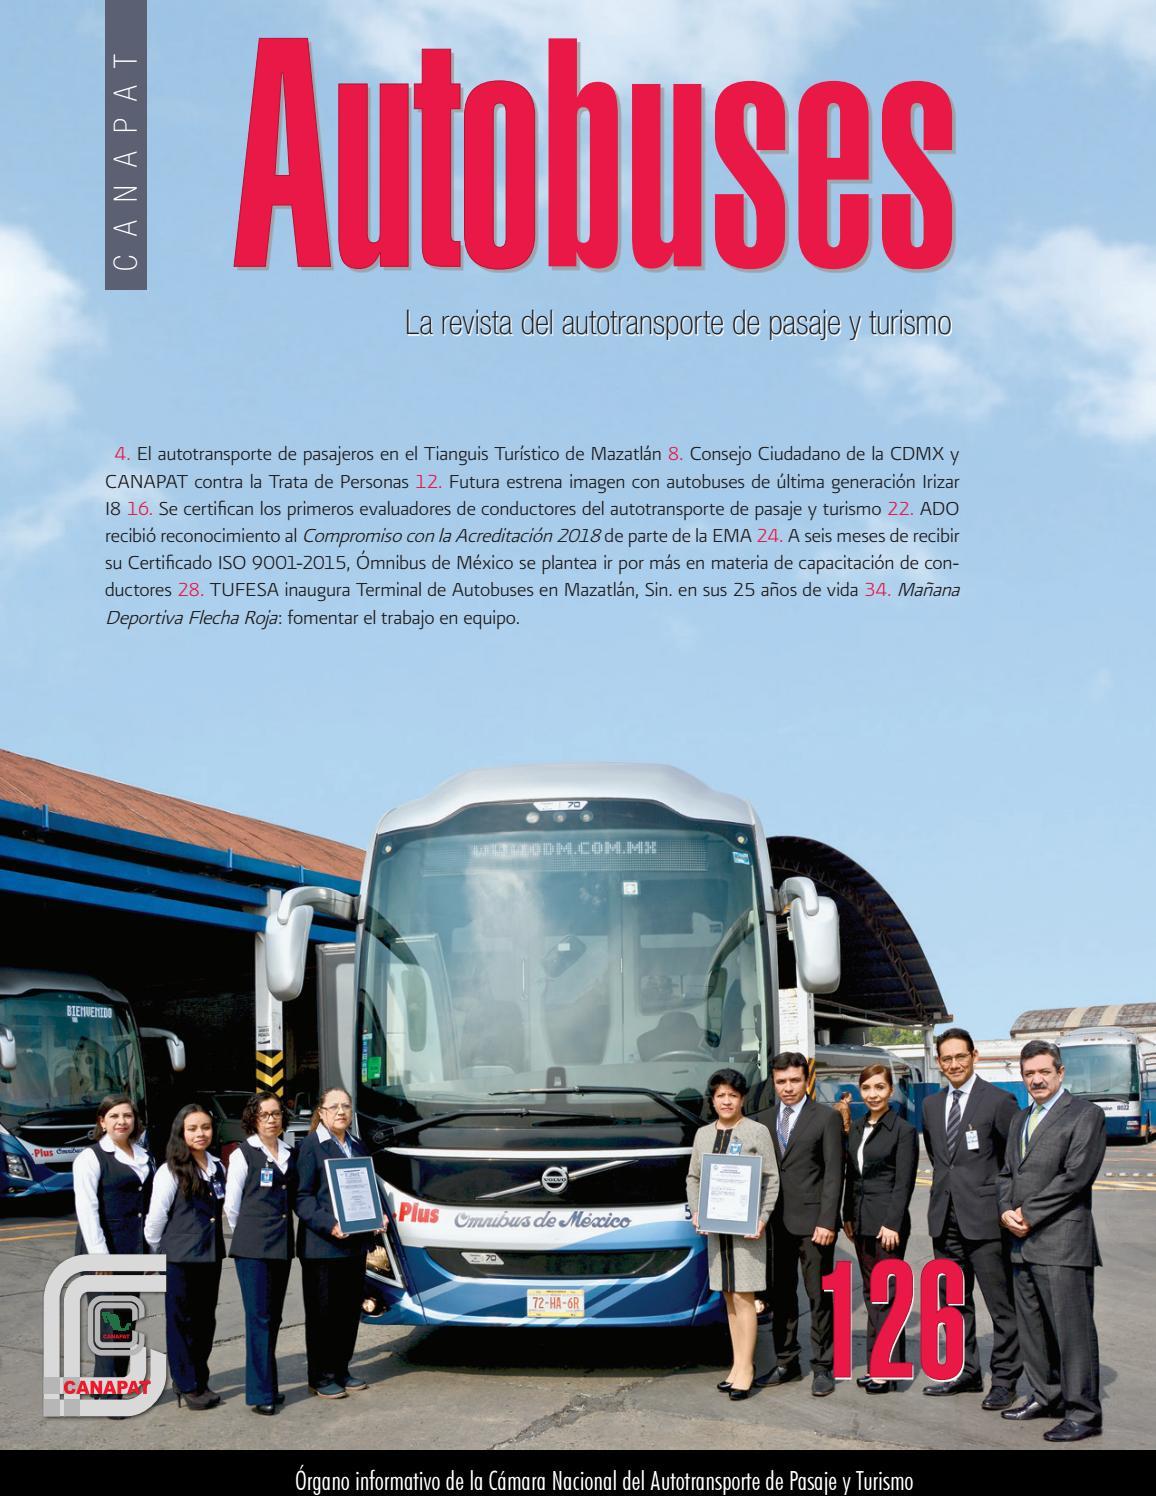 Revista Autobuses No. 126 by Francisco Martínez - Issuu